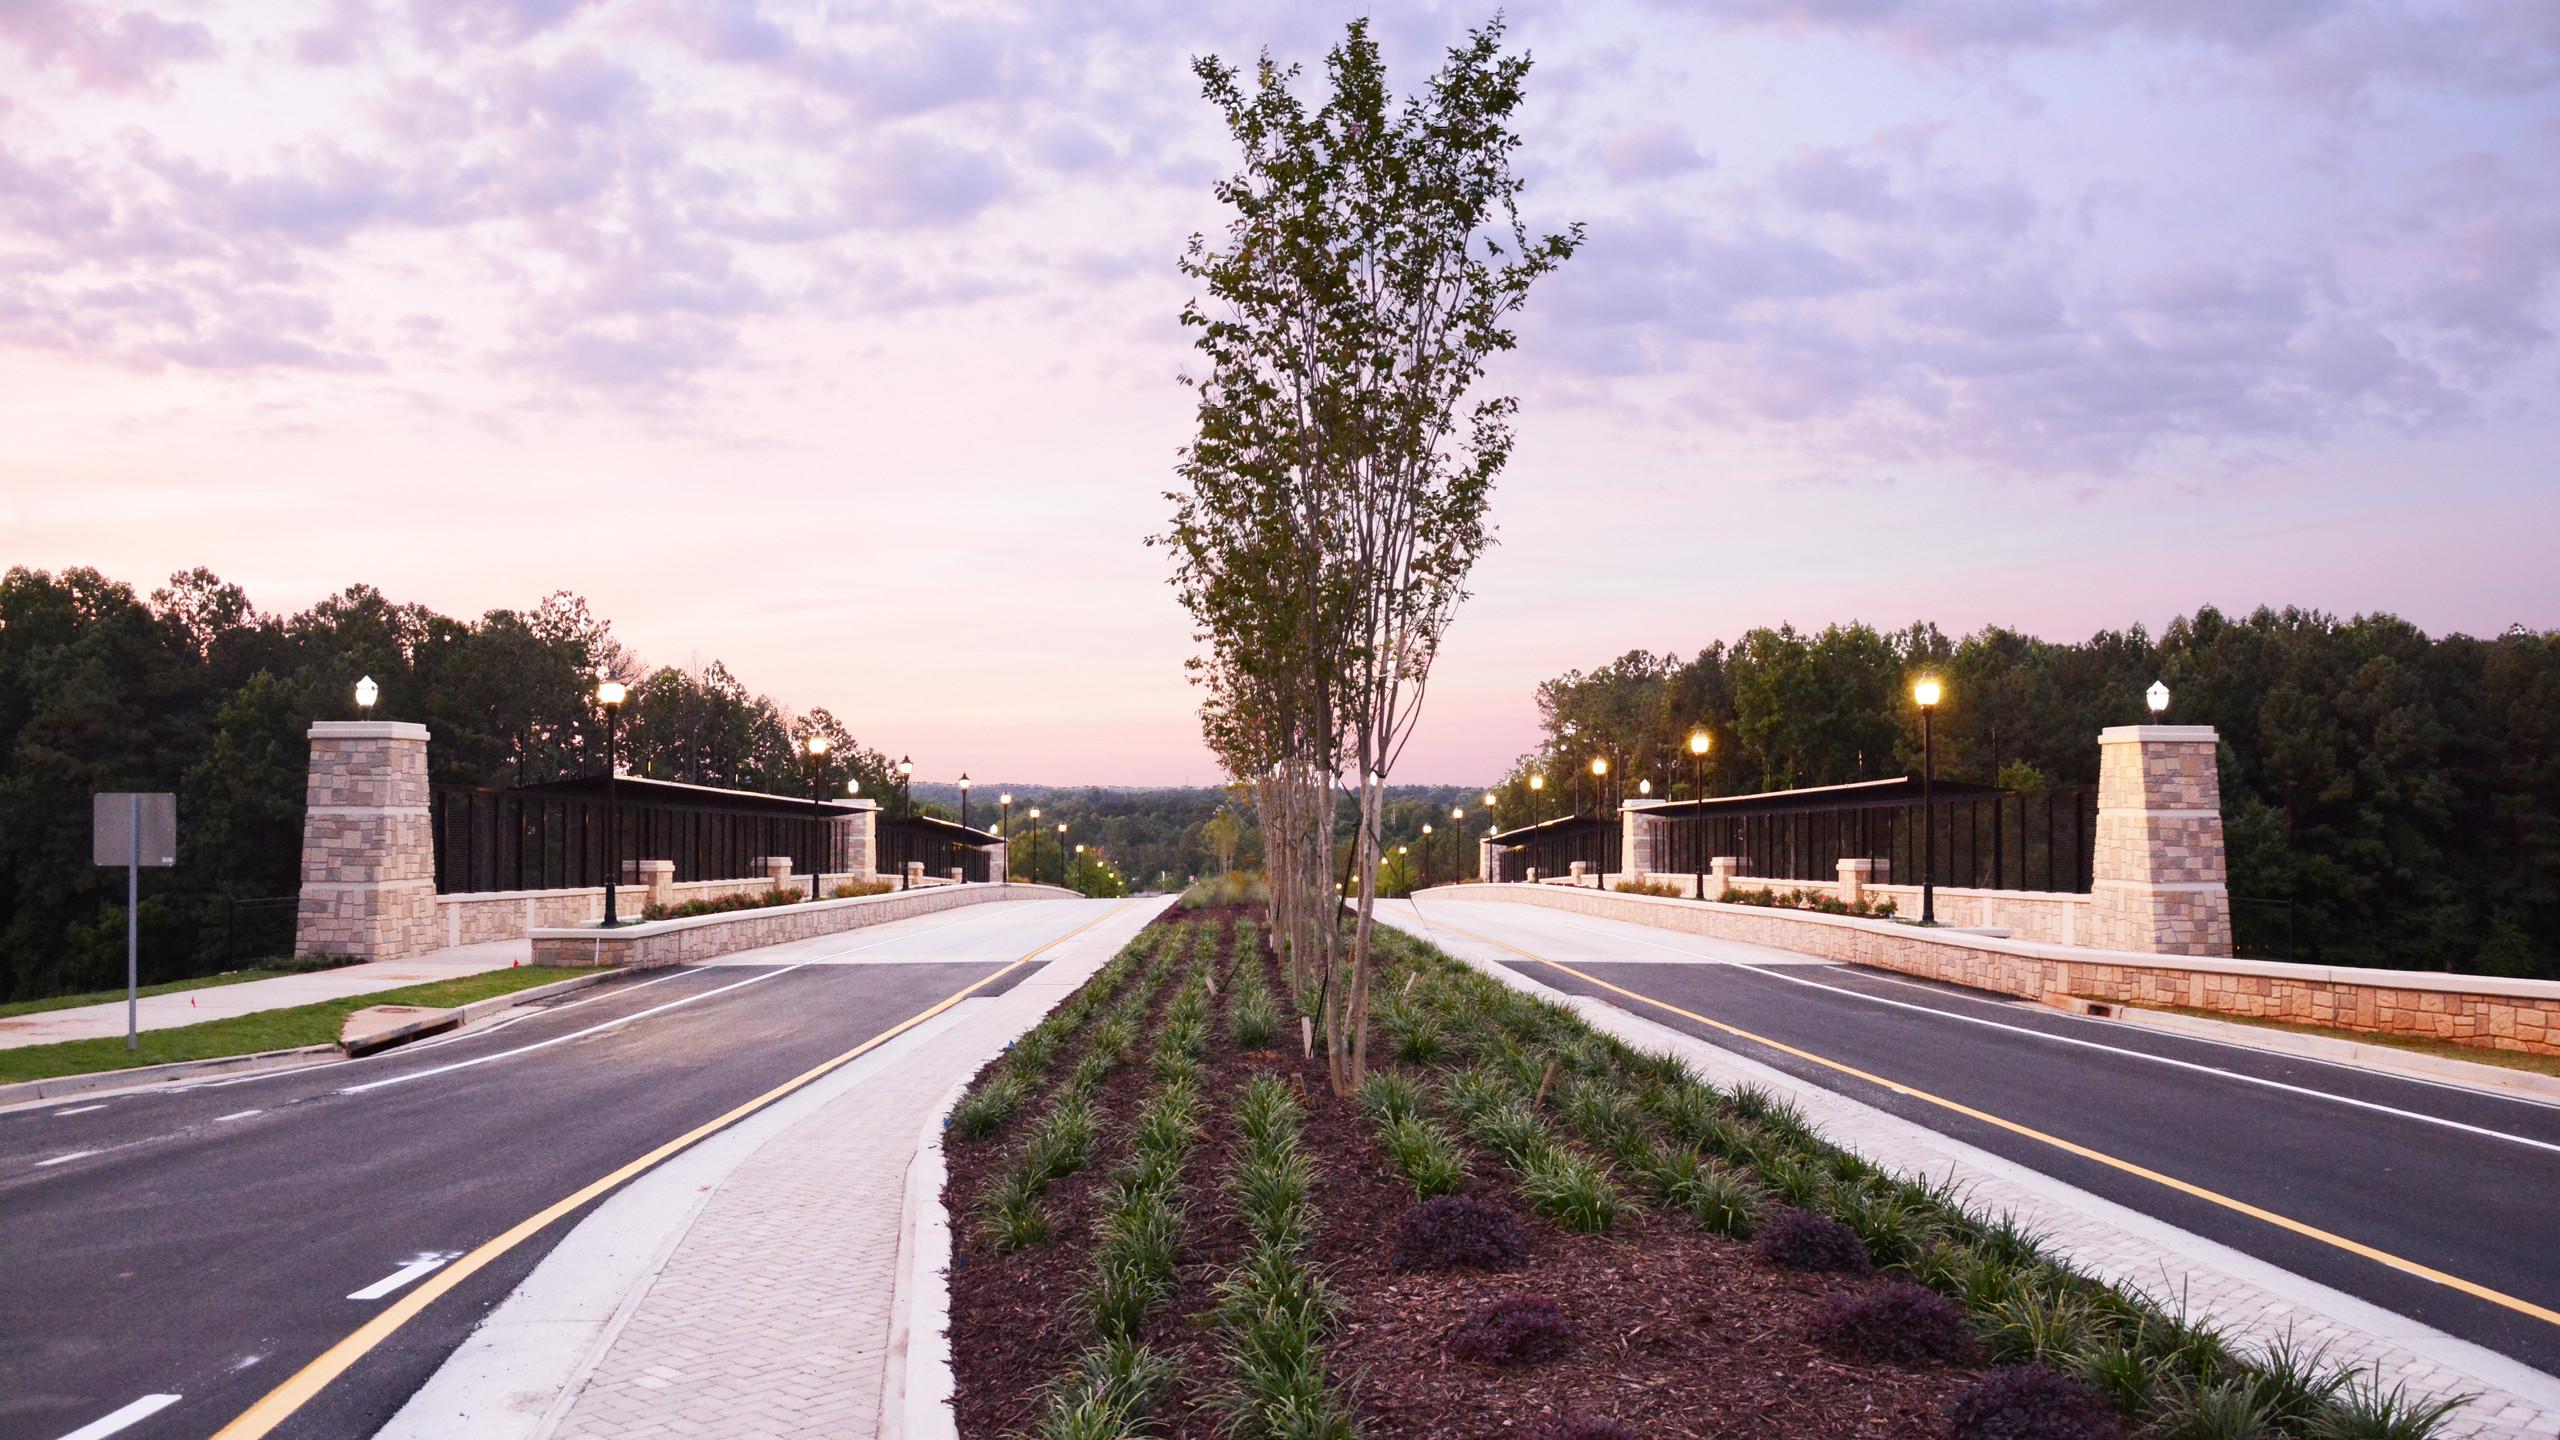 Encore Parkway Bridge